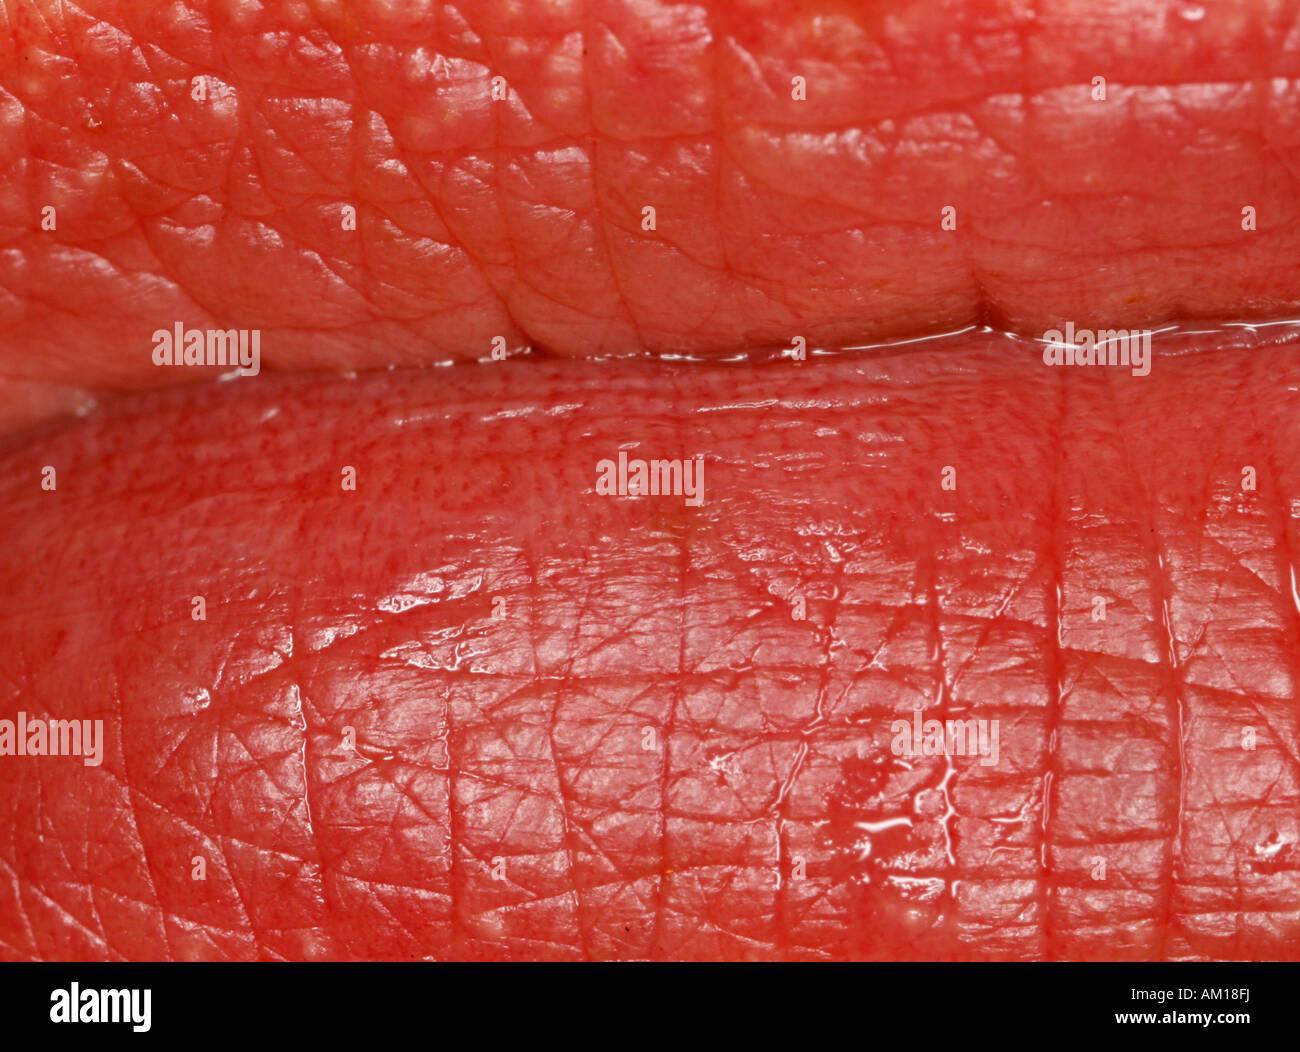 Extreme close-up di labbra umane Immagini Stock